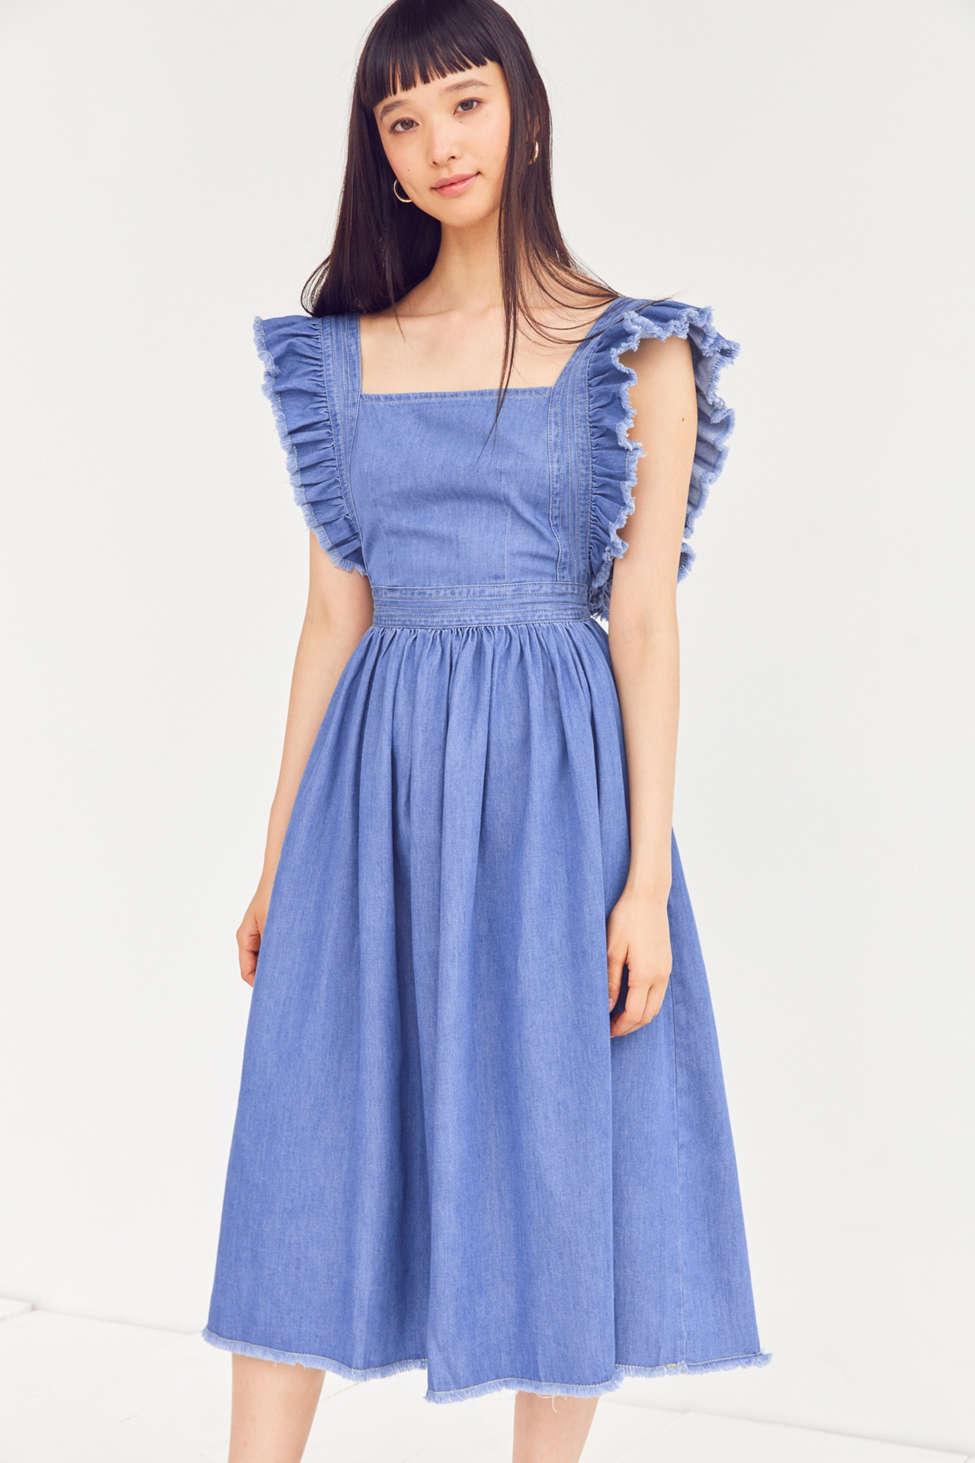 Kimchi Blue Denim Ruffle Apron Midi Dress | Urban Outfitters